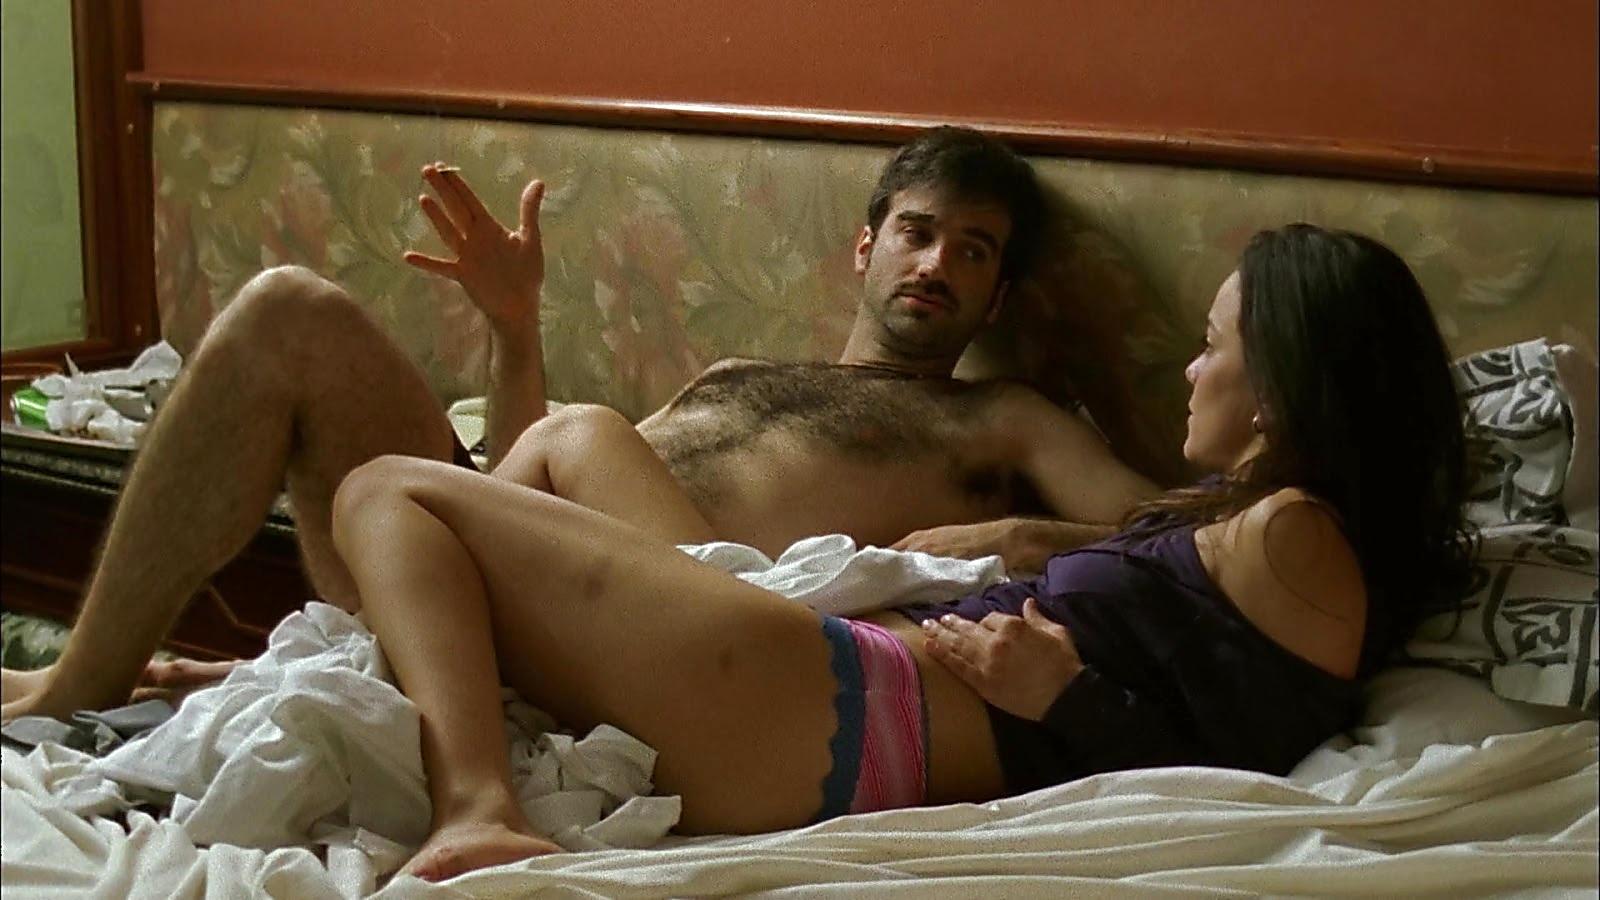 Daniel Hendler sexy shirtless scene August 1, 2020, 10am